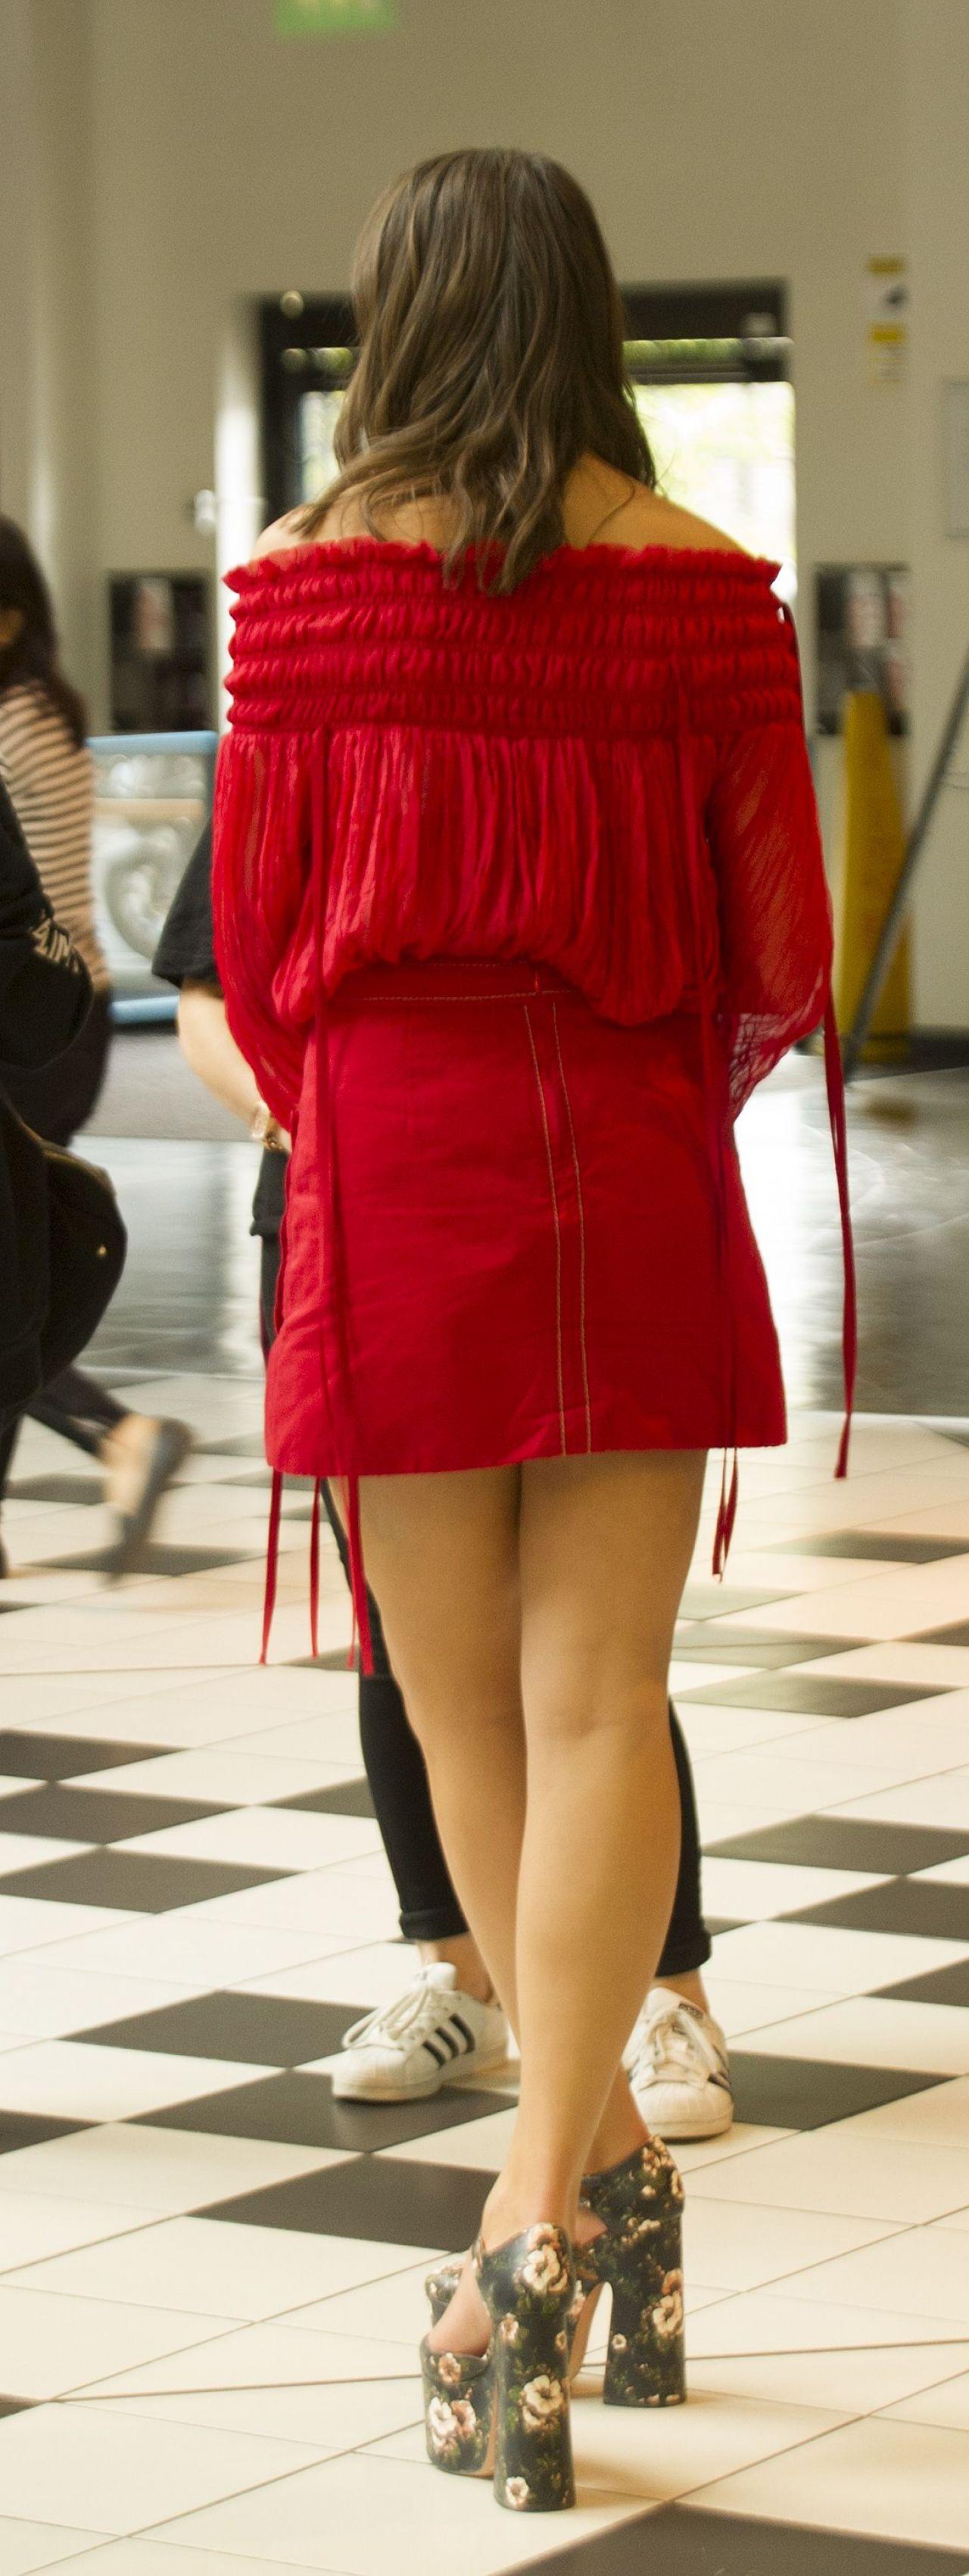 Dua Lipa In Red Mini Dress London 10 2 2016